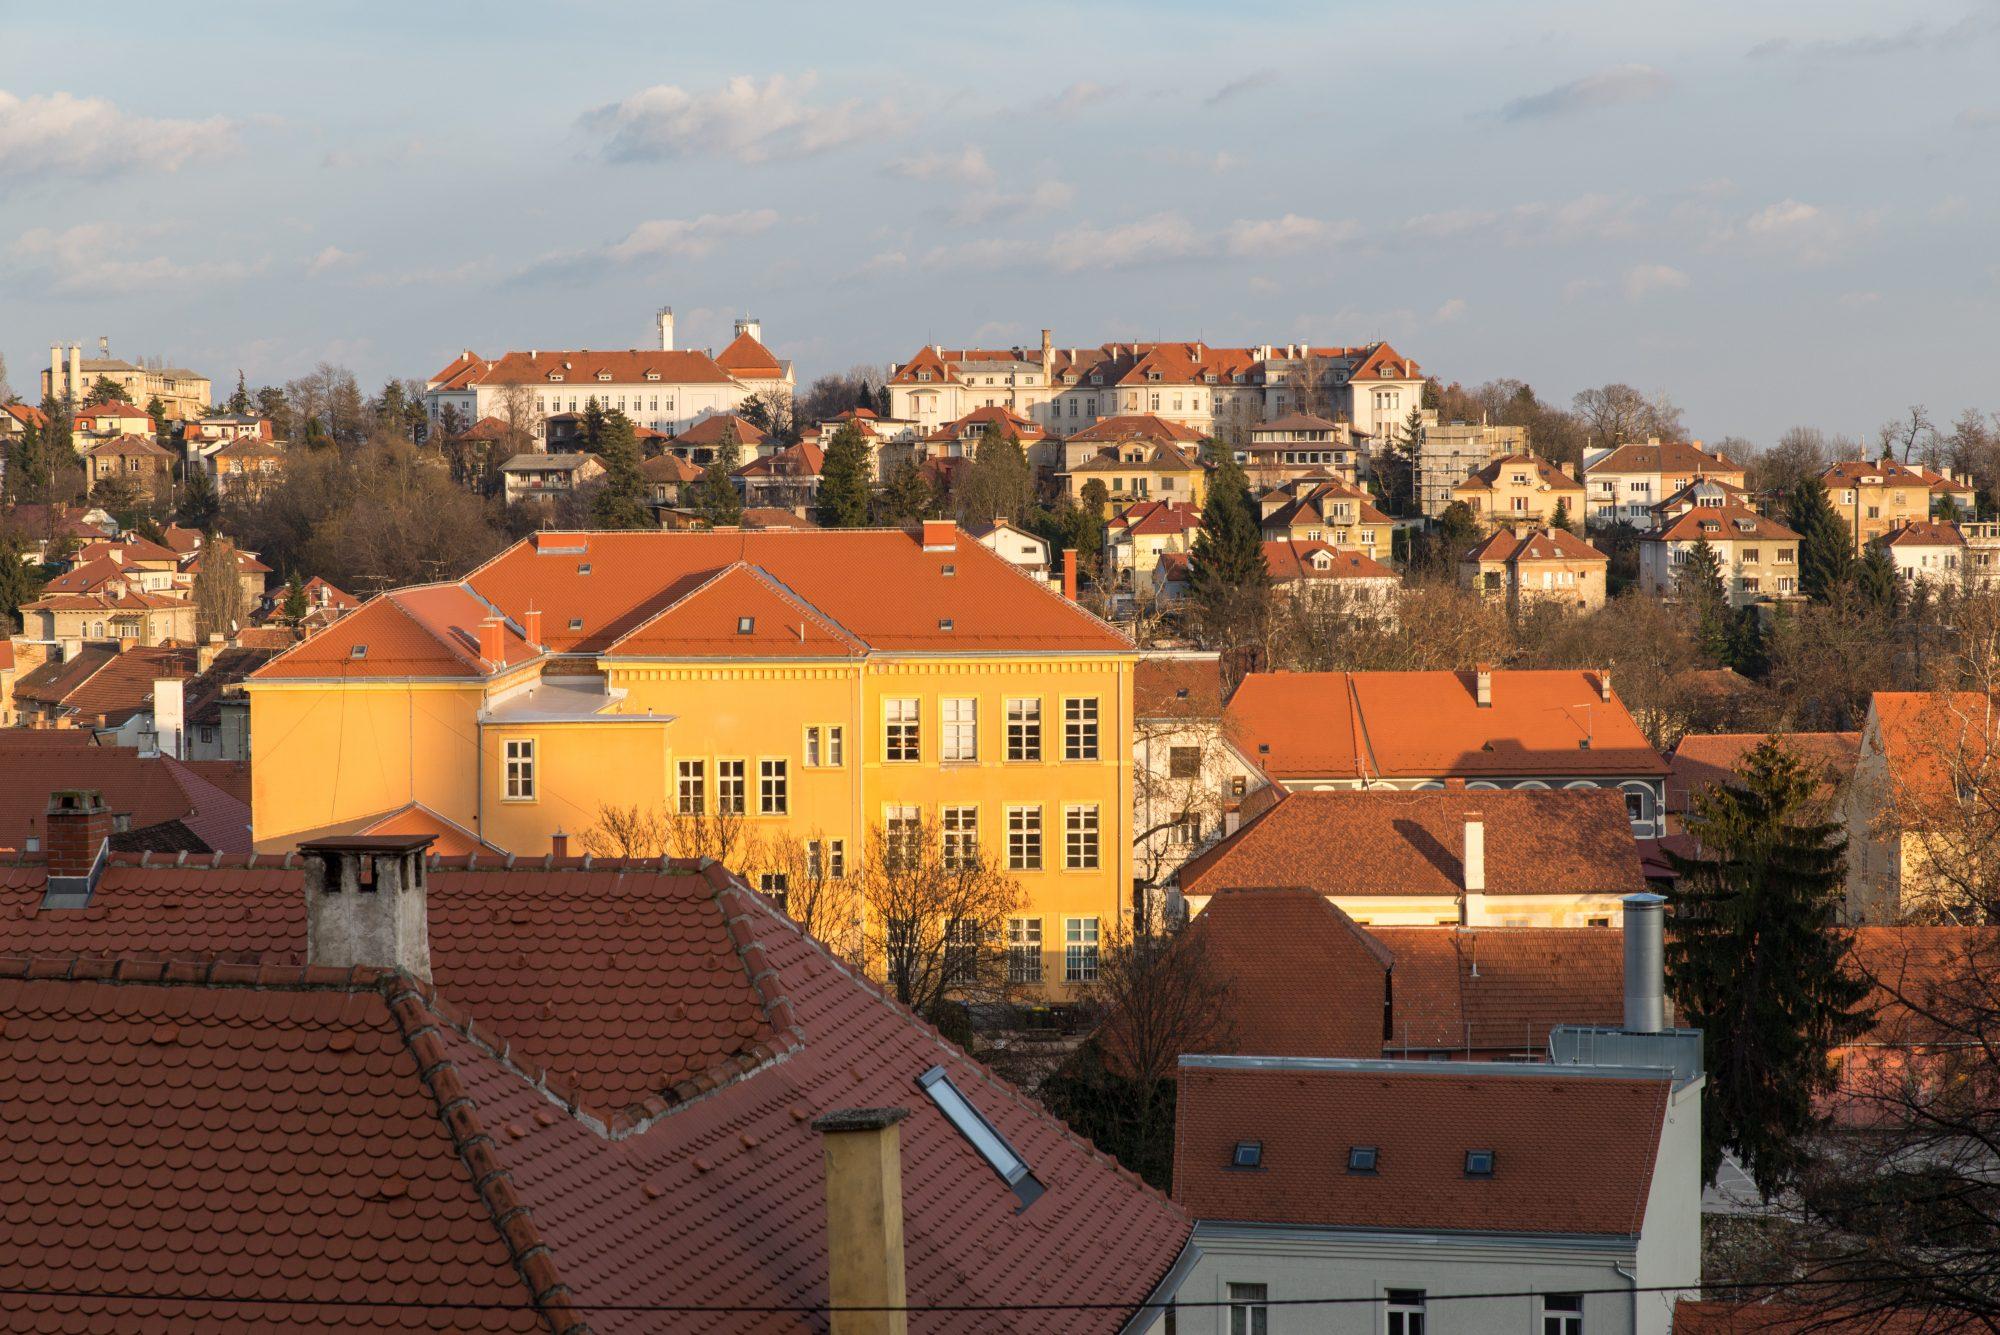 Panorama, Zagreb, Croatia.